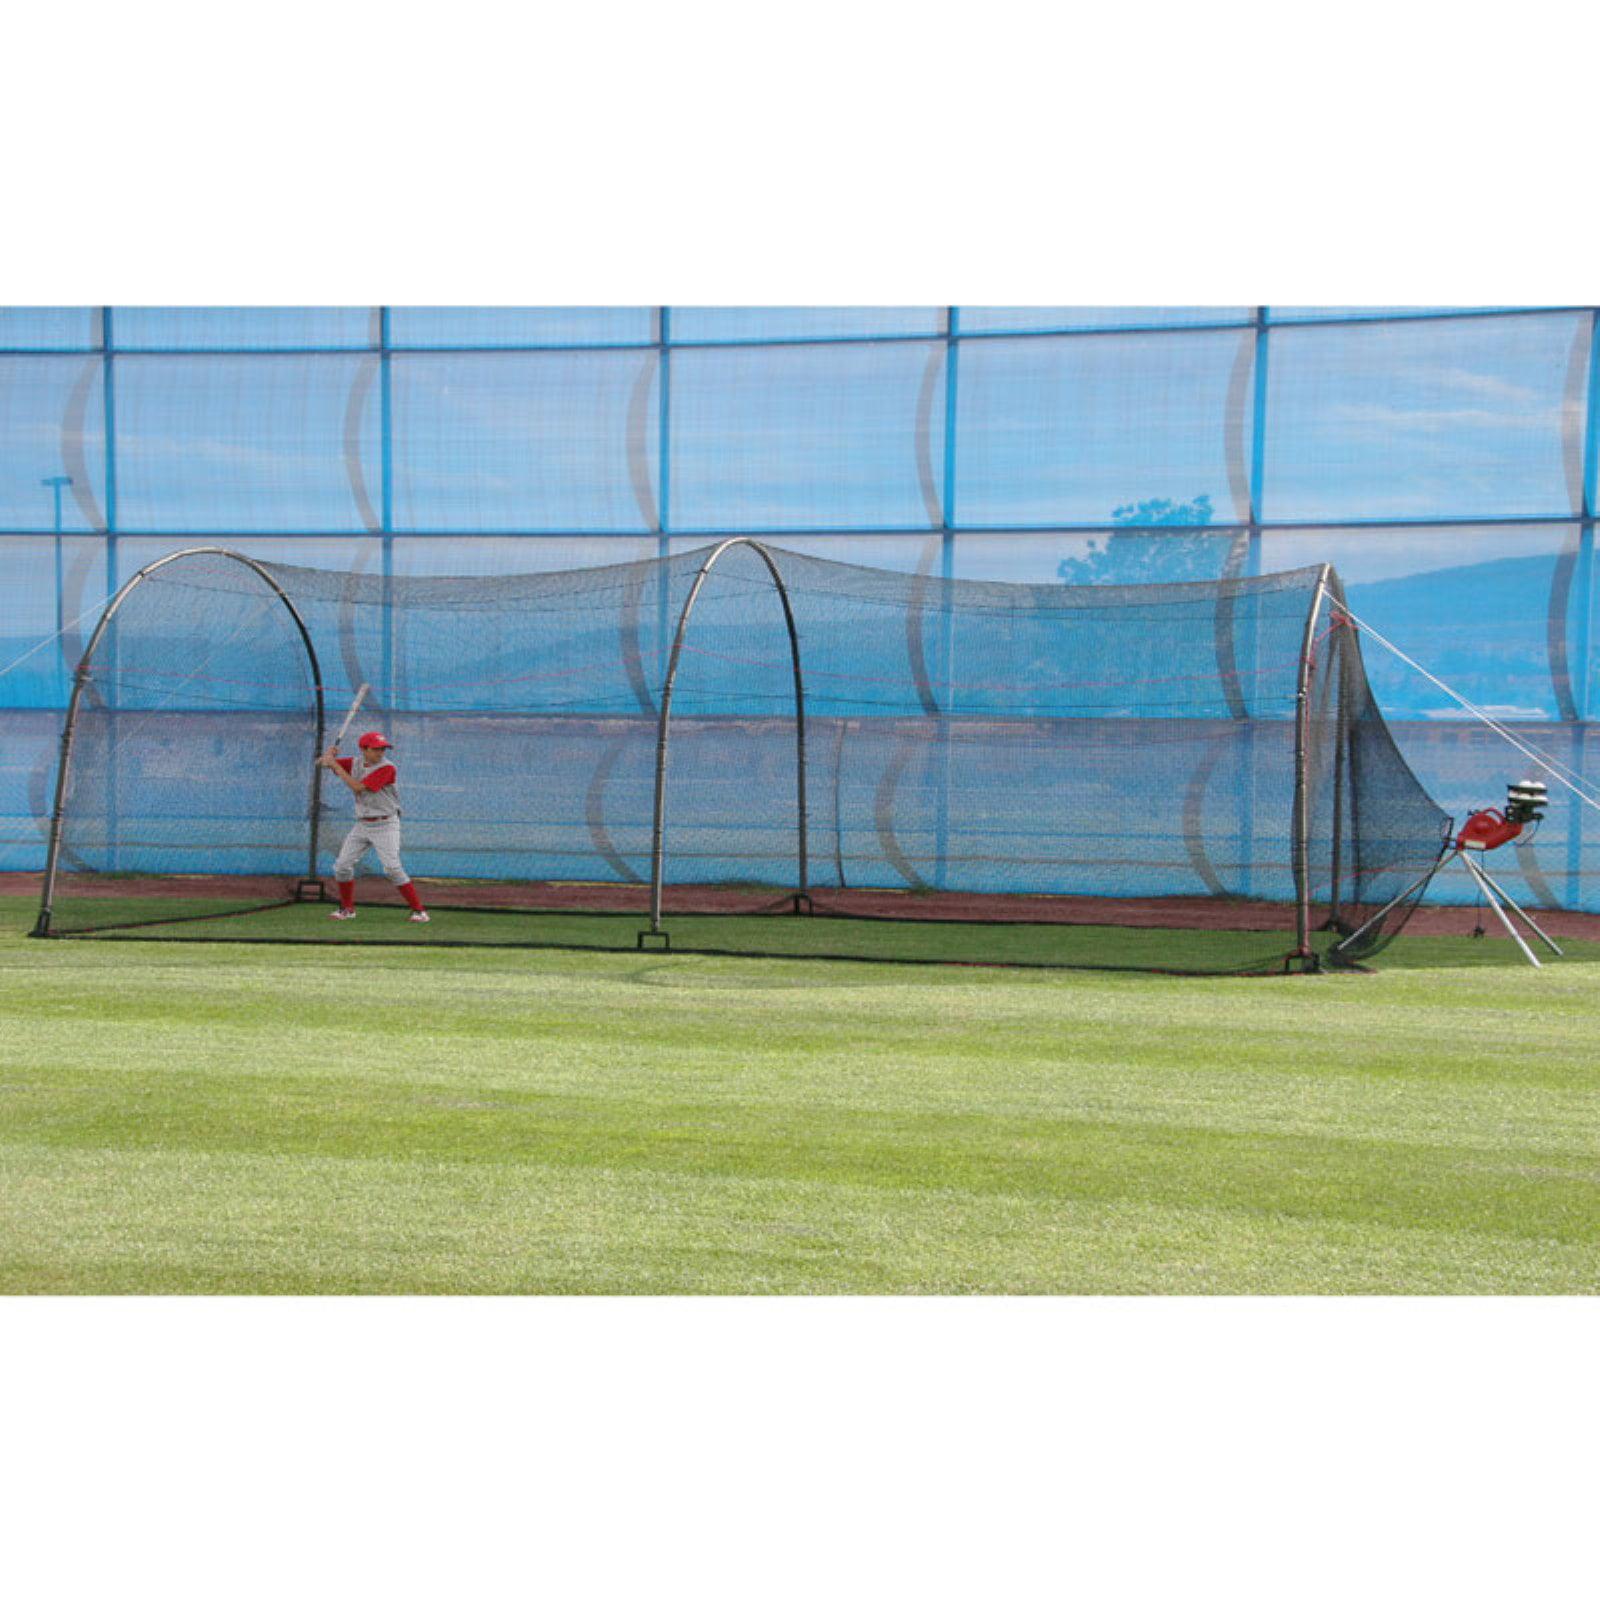 Heater Sports 30 ft. Xtender Baseball Batting Cage